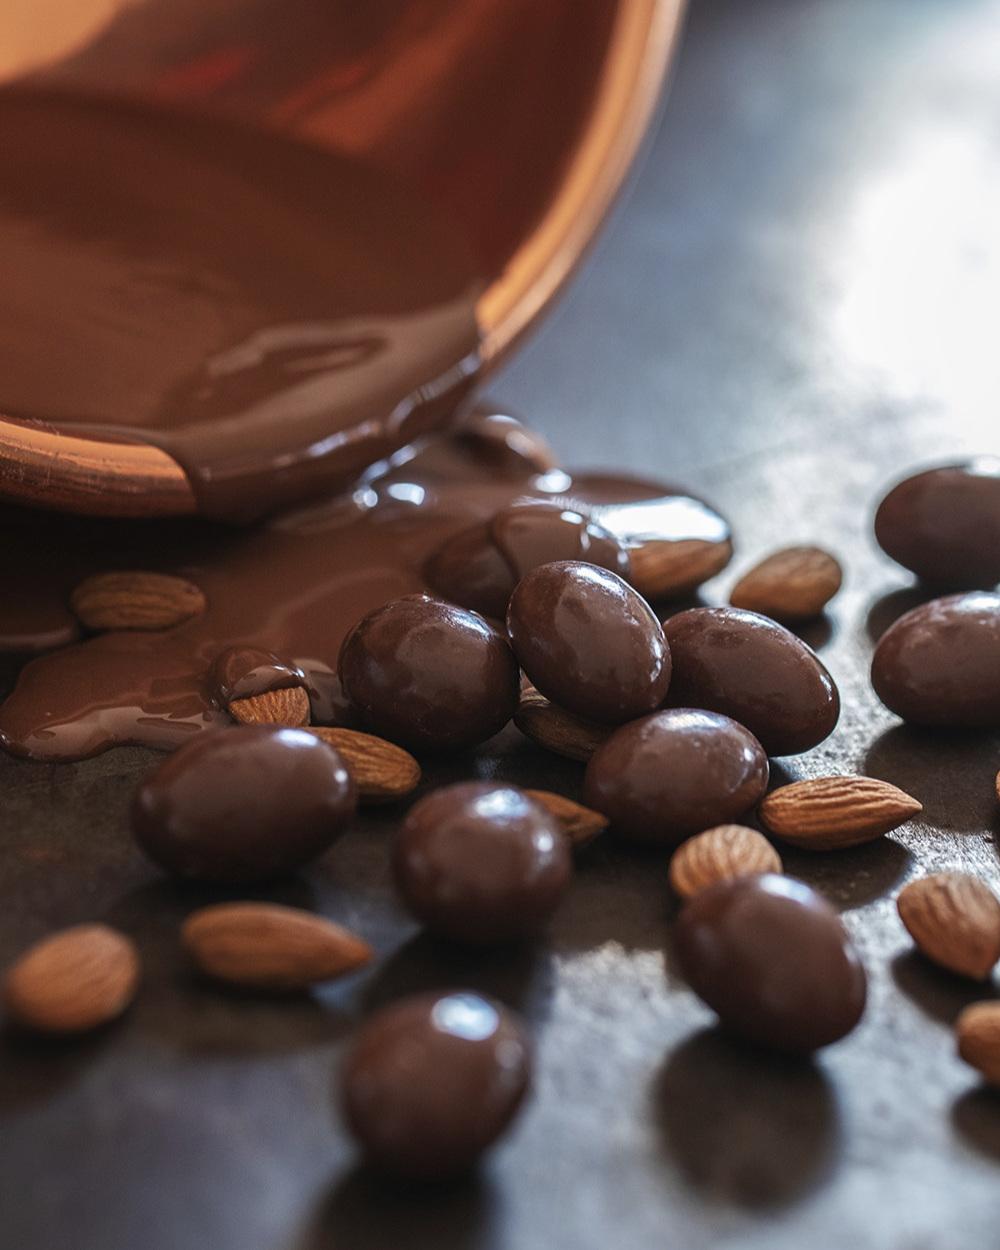 Almonds+-+MIlk+Chocolate++%283%29.jpg